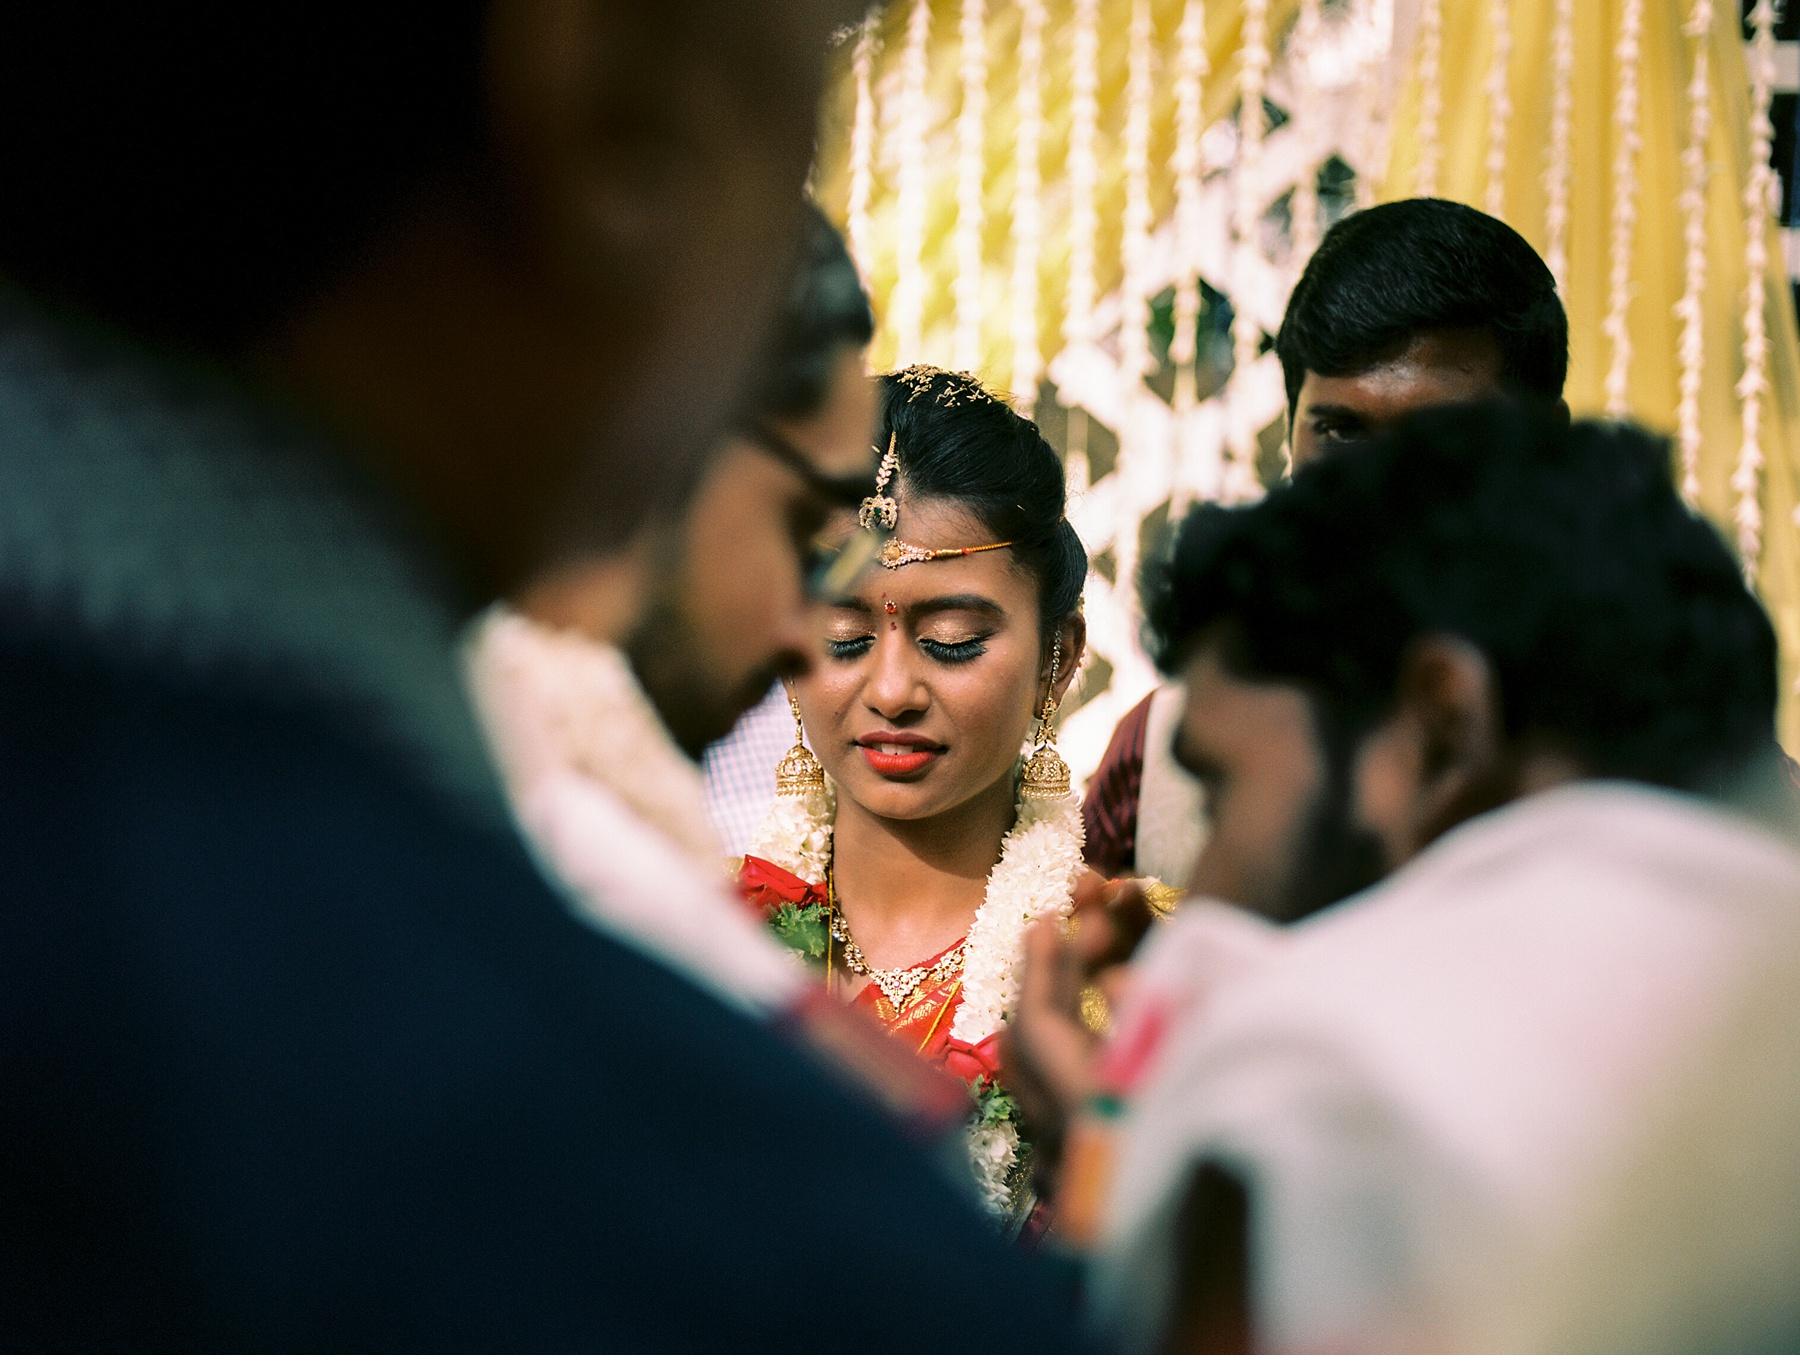 Southern_India_Wedding_Ceremony_0009.jpg